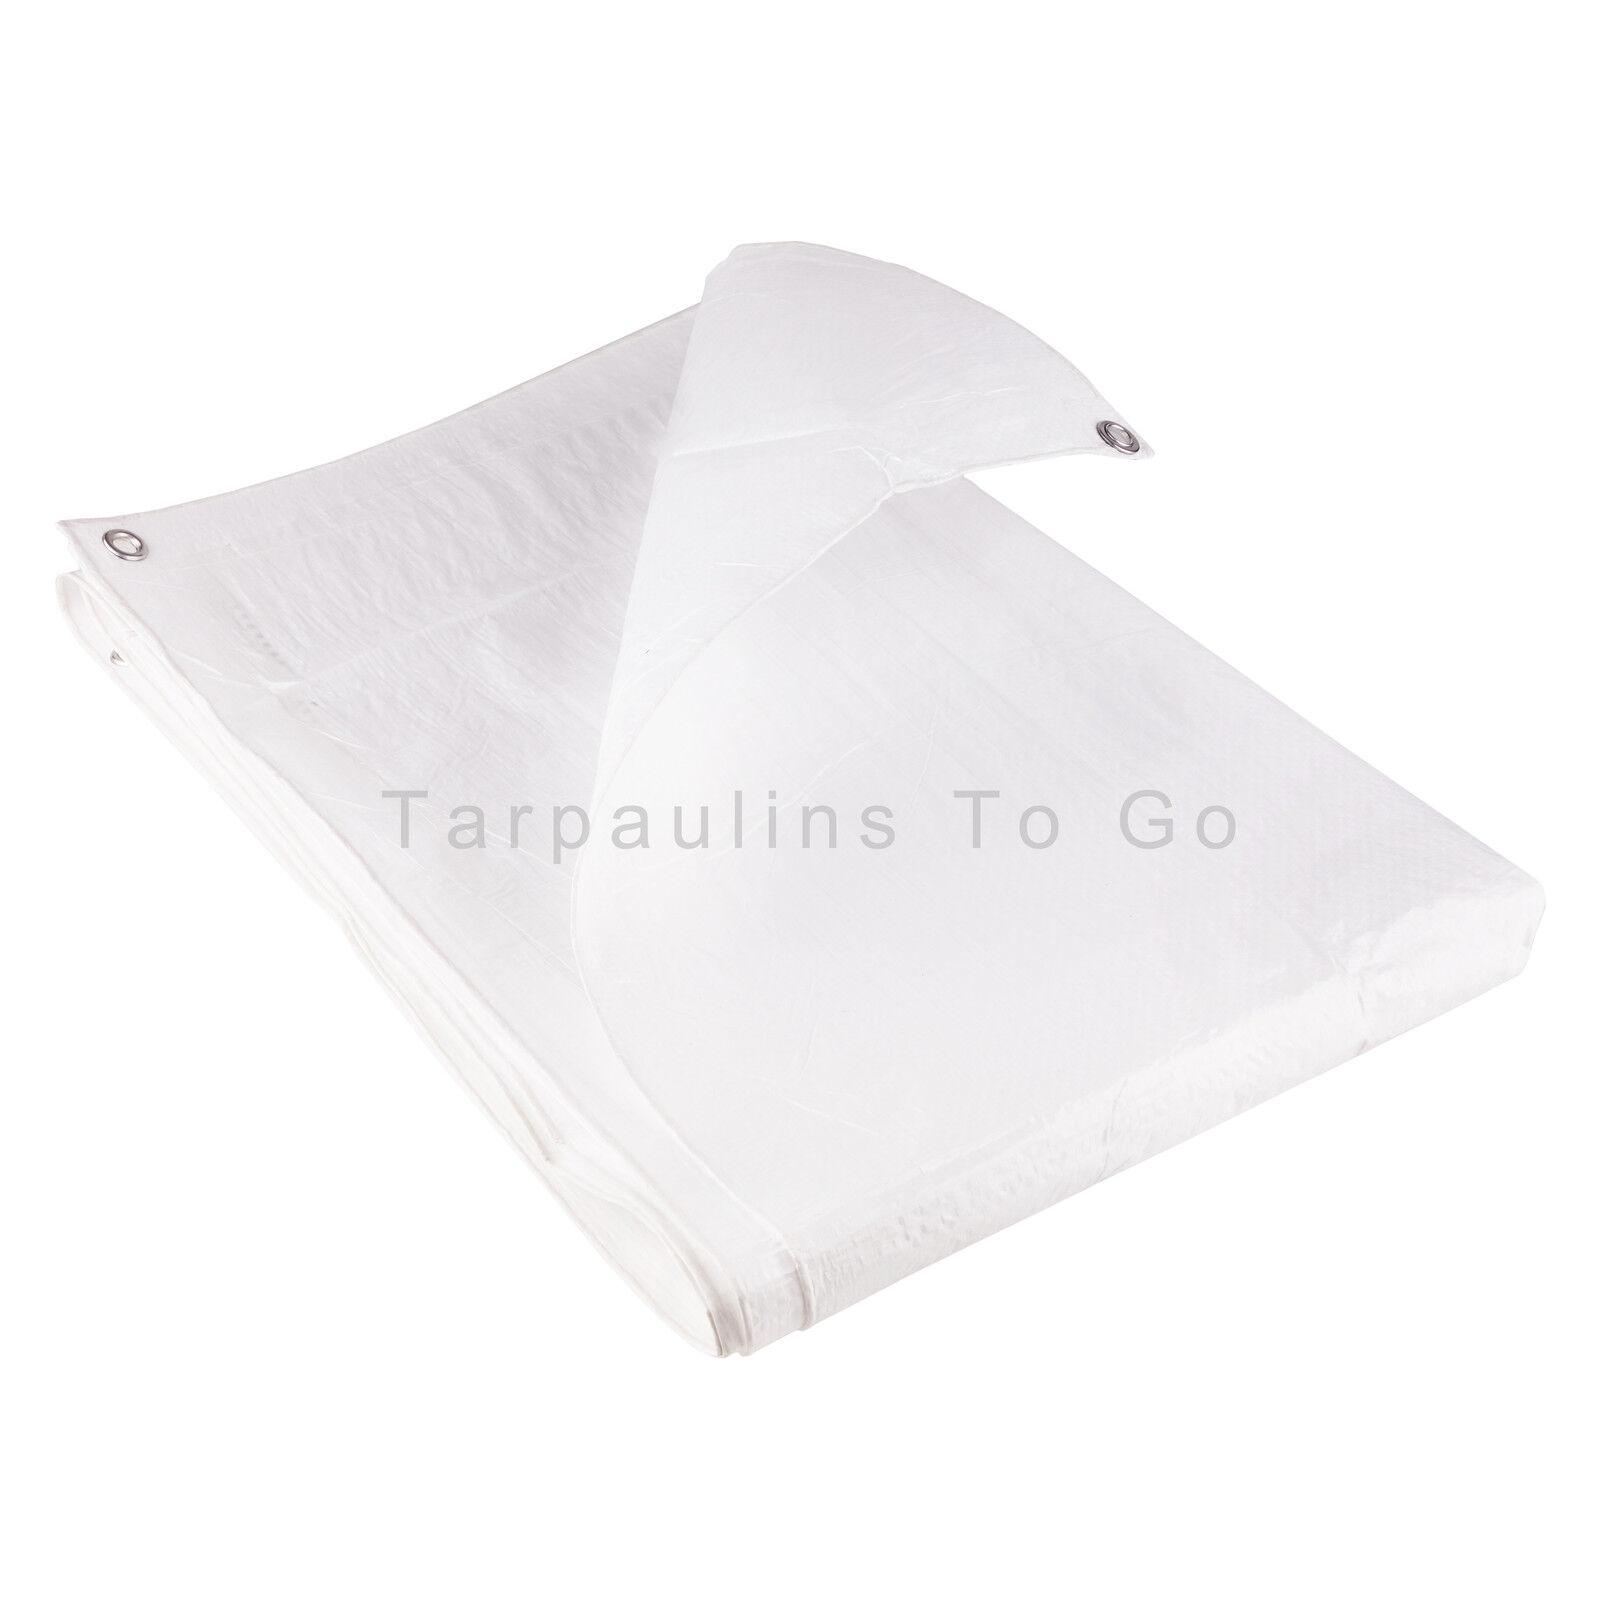 Waterproof Tarpaulin Ground Sheet Cover Camping Cover Sheet Large Value Tarp with eyelets acb0fa